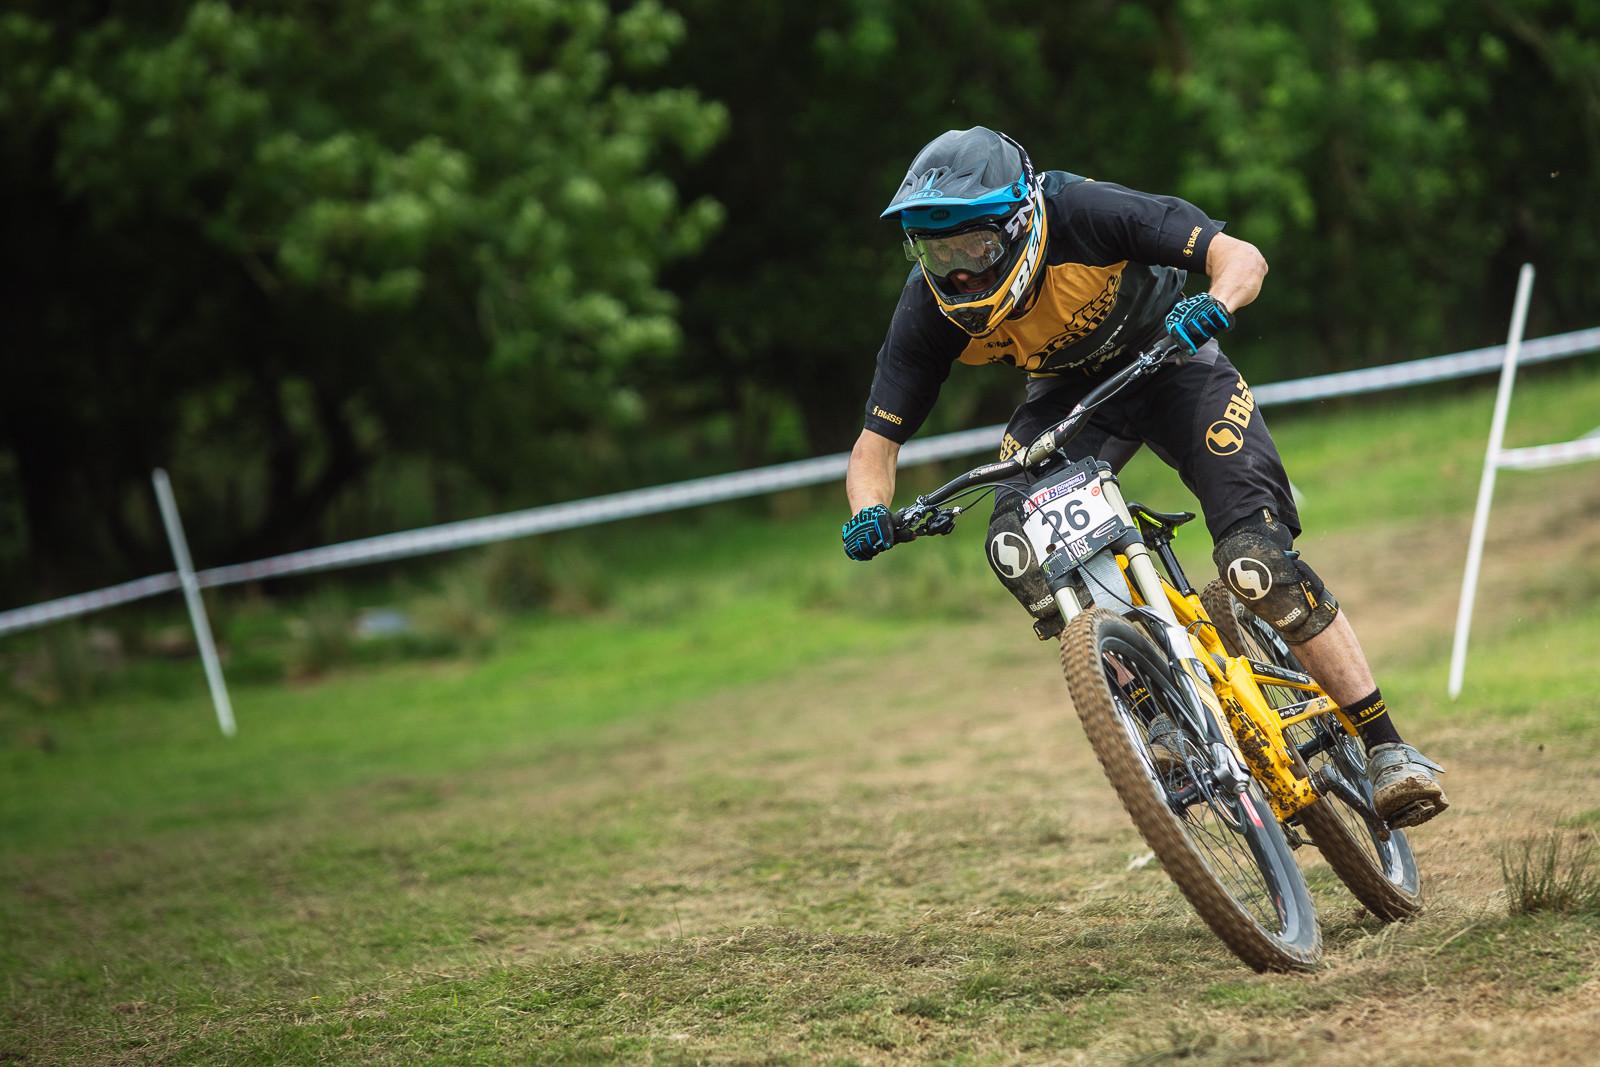 Phil Atwill, British DH Series, Bala - RACE REPORT - 2015 British Downhill Series Bala - Mountain Biking Pictures - Vital MTB